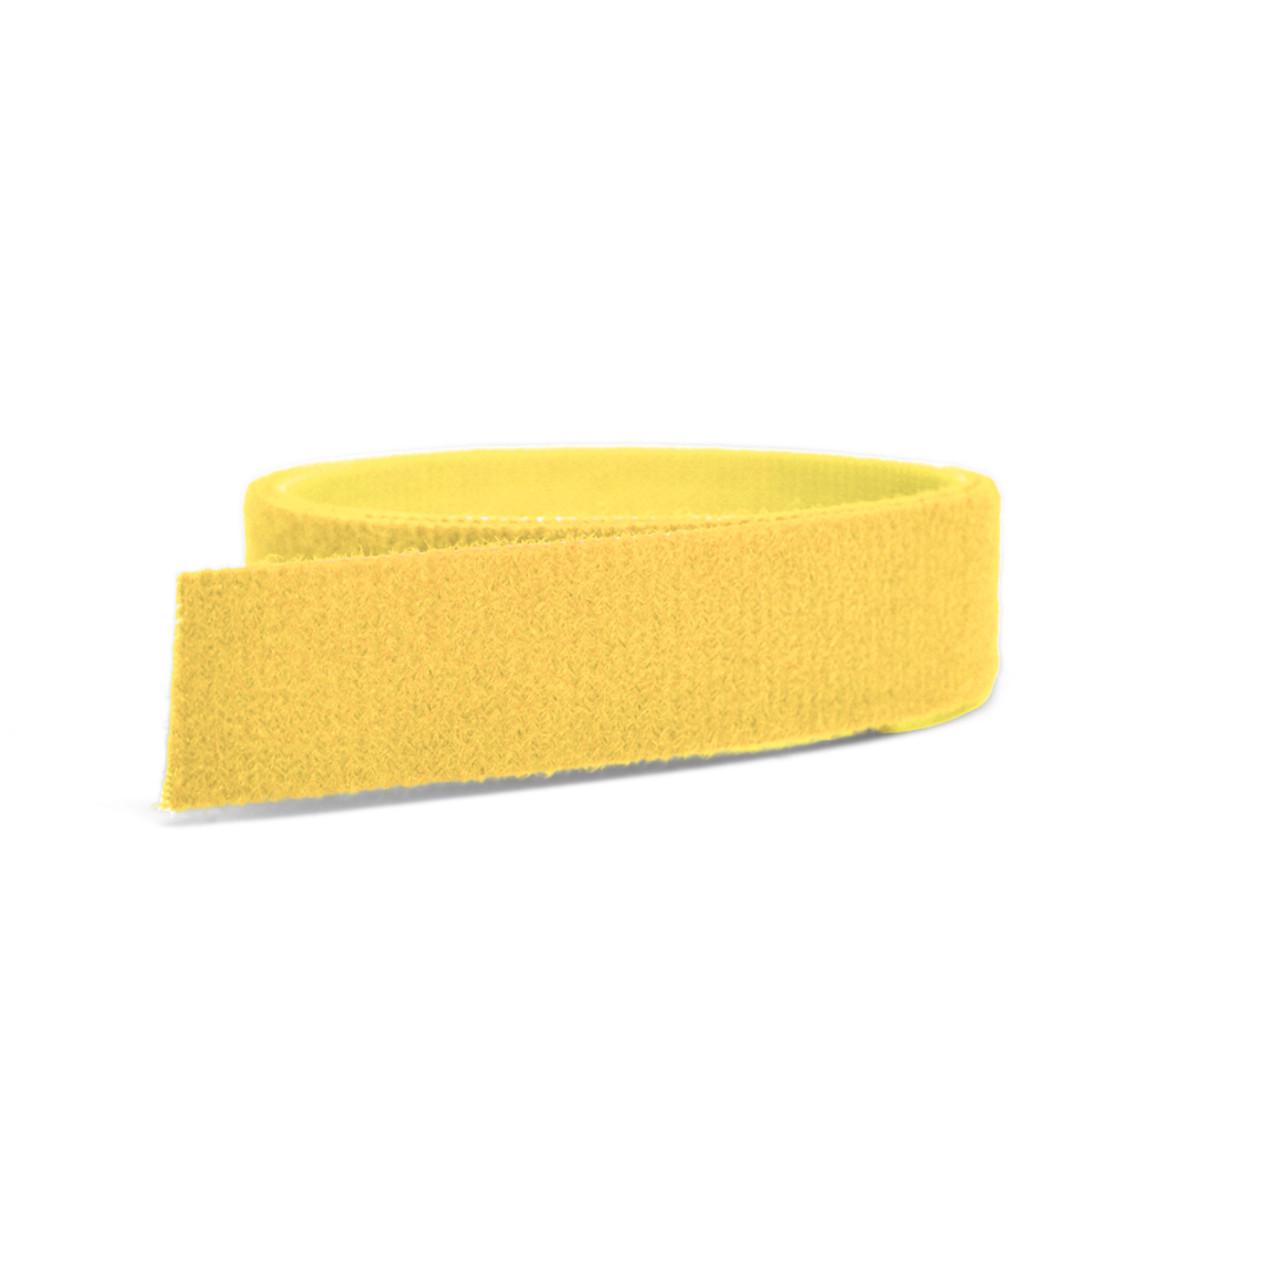 VELCRO® Brand ONE-WRAP® Tape Yellow Mini Rolls